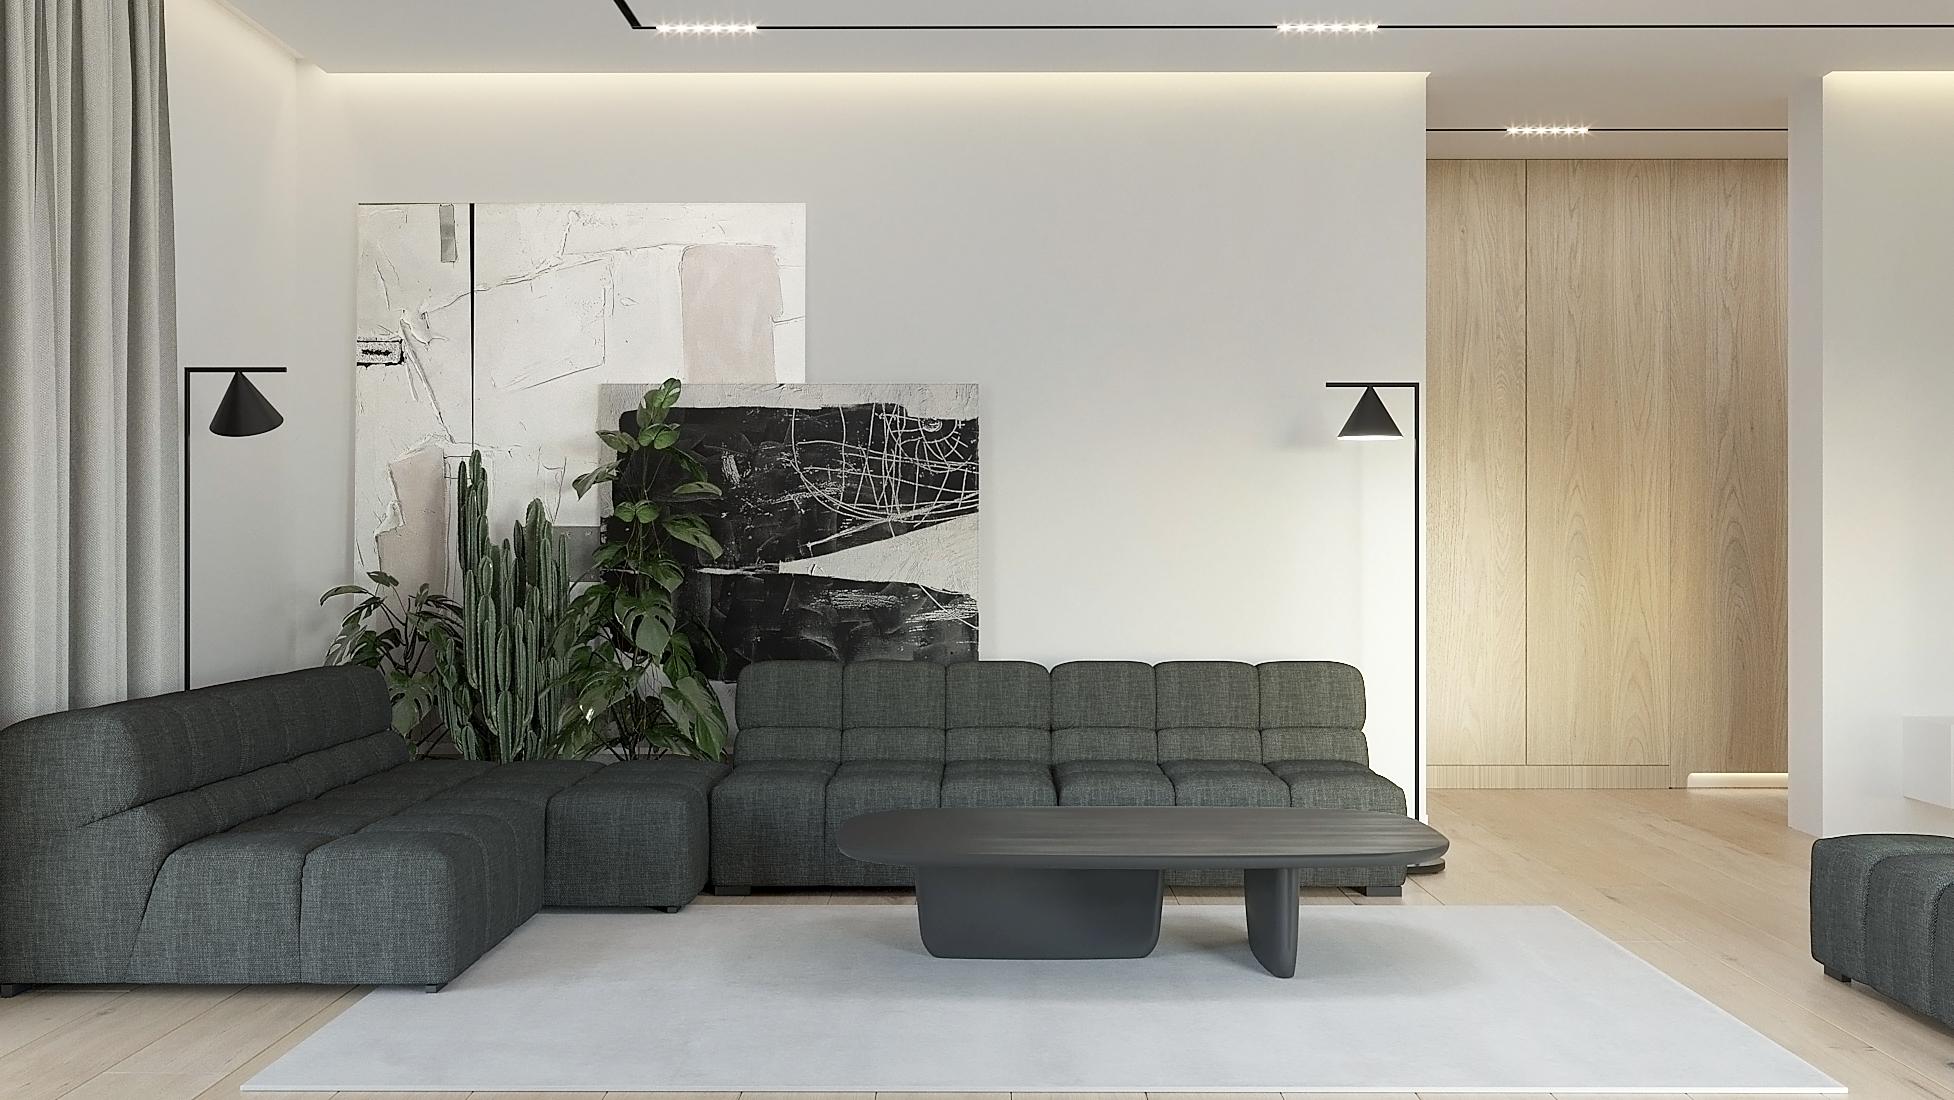 7 projket wnetrz D555 dom Libertow salon szara sofa lampa podlogowa czarna drewniana podloga